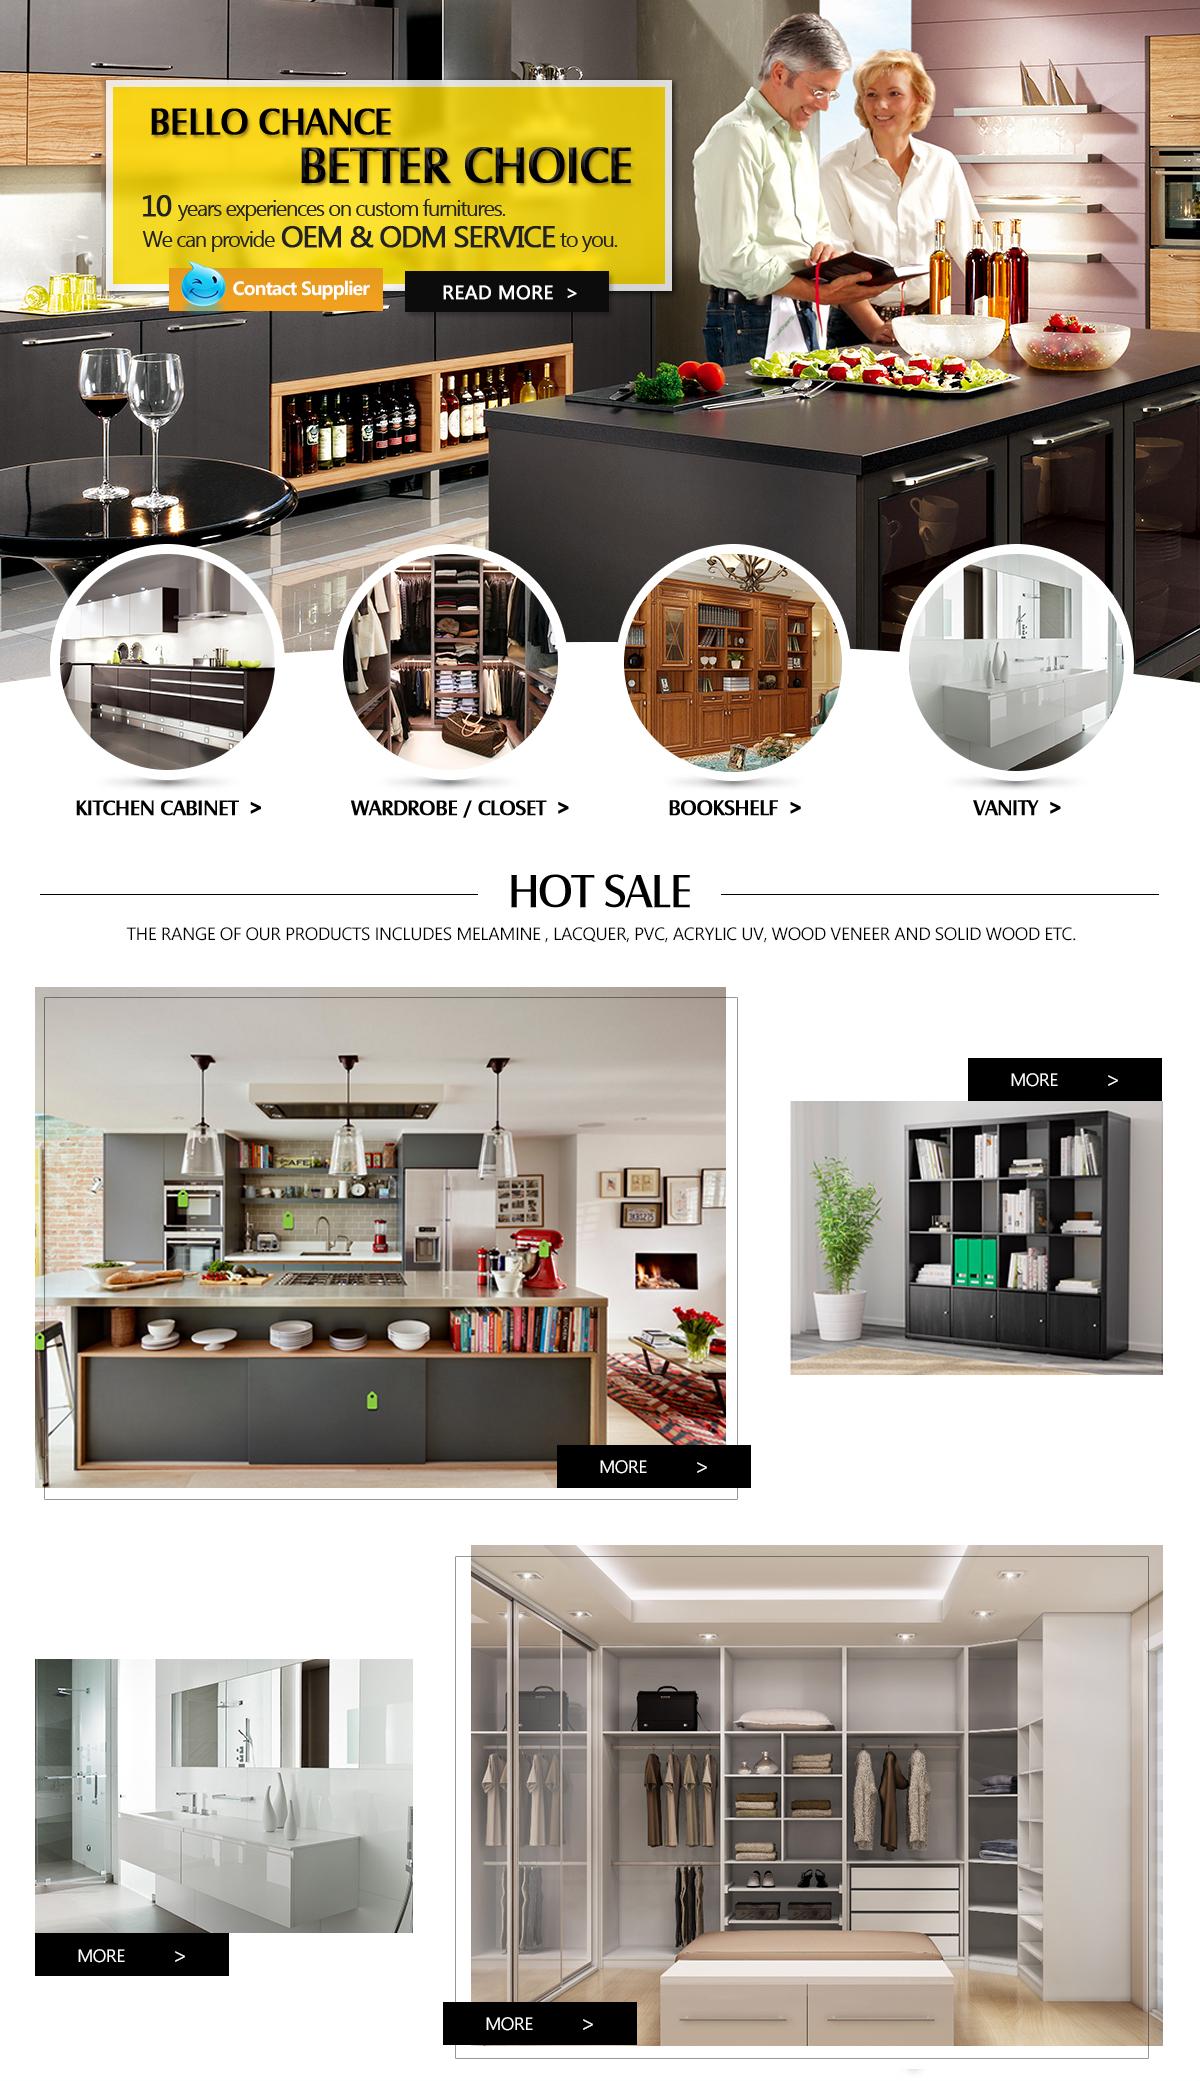 Foshan Bello Chance Housing Co., Limited - kitchen cabinets, wardrobes